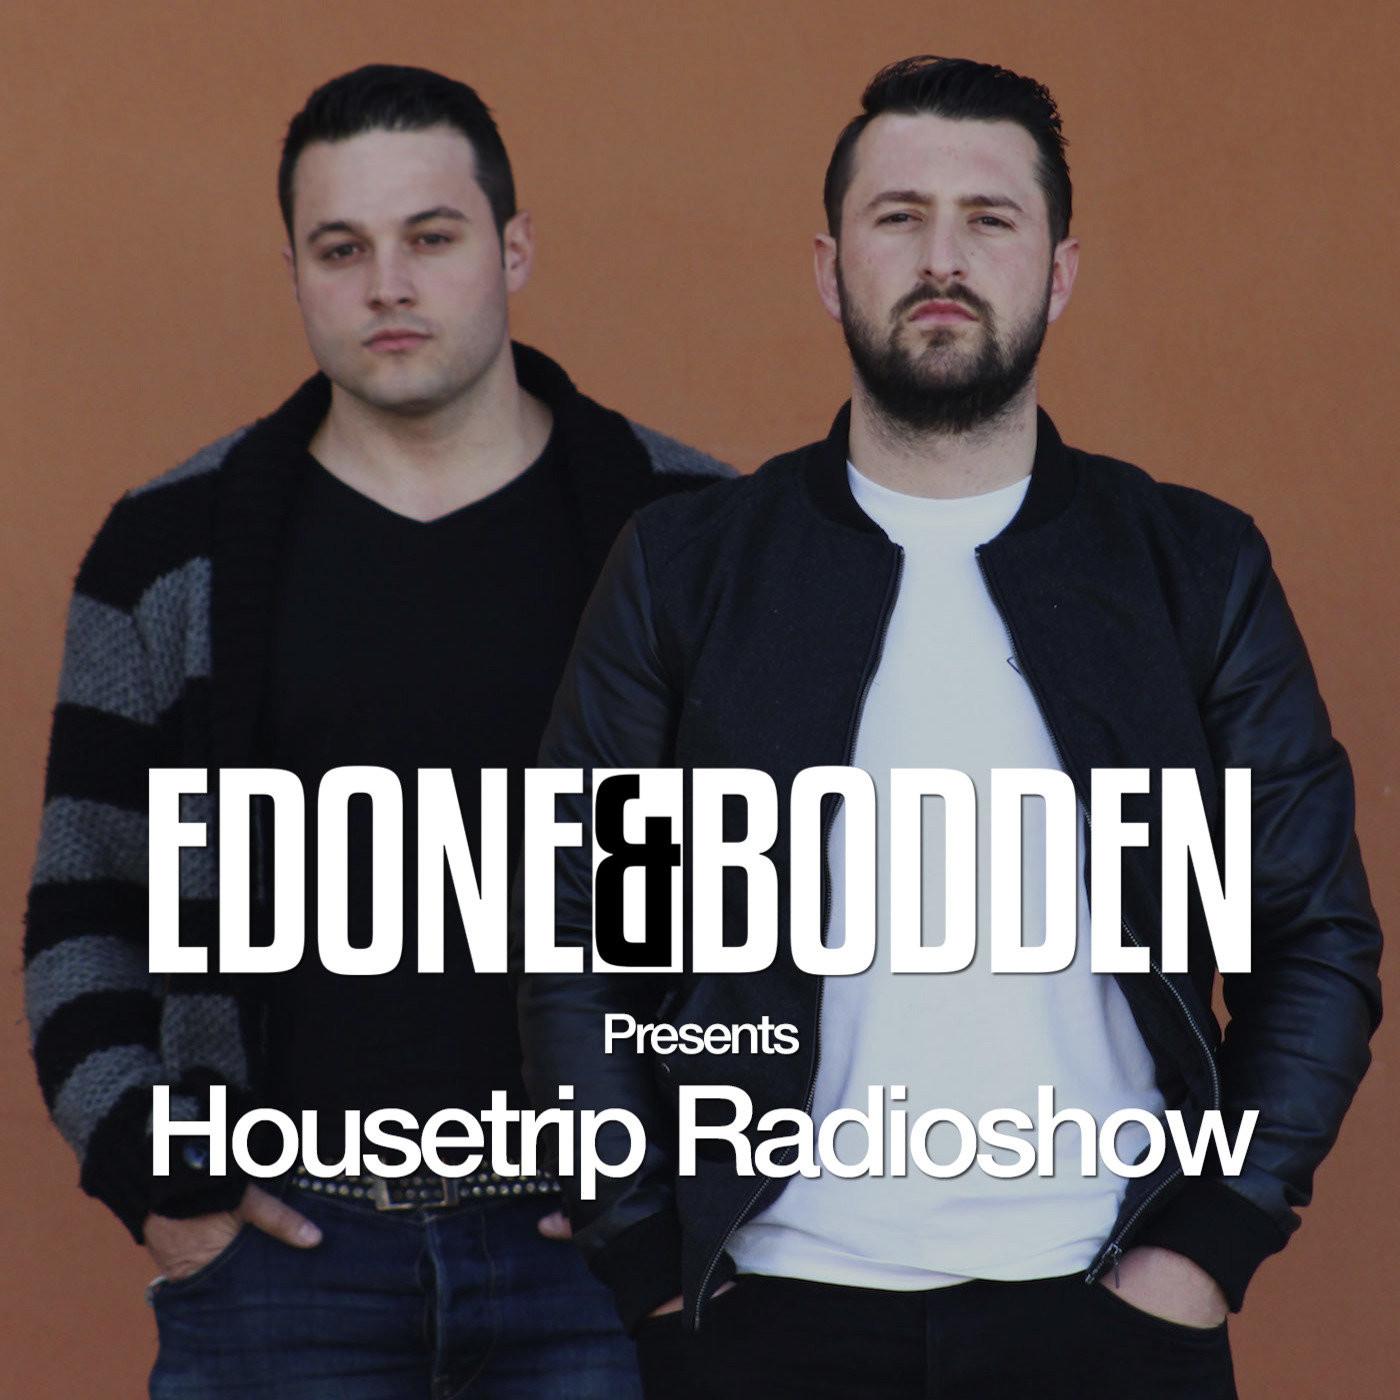 EdOne & Bodden | Housetrip Radioshow